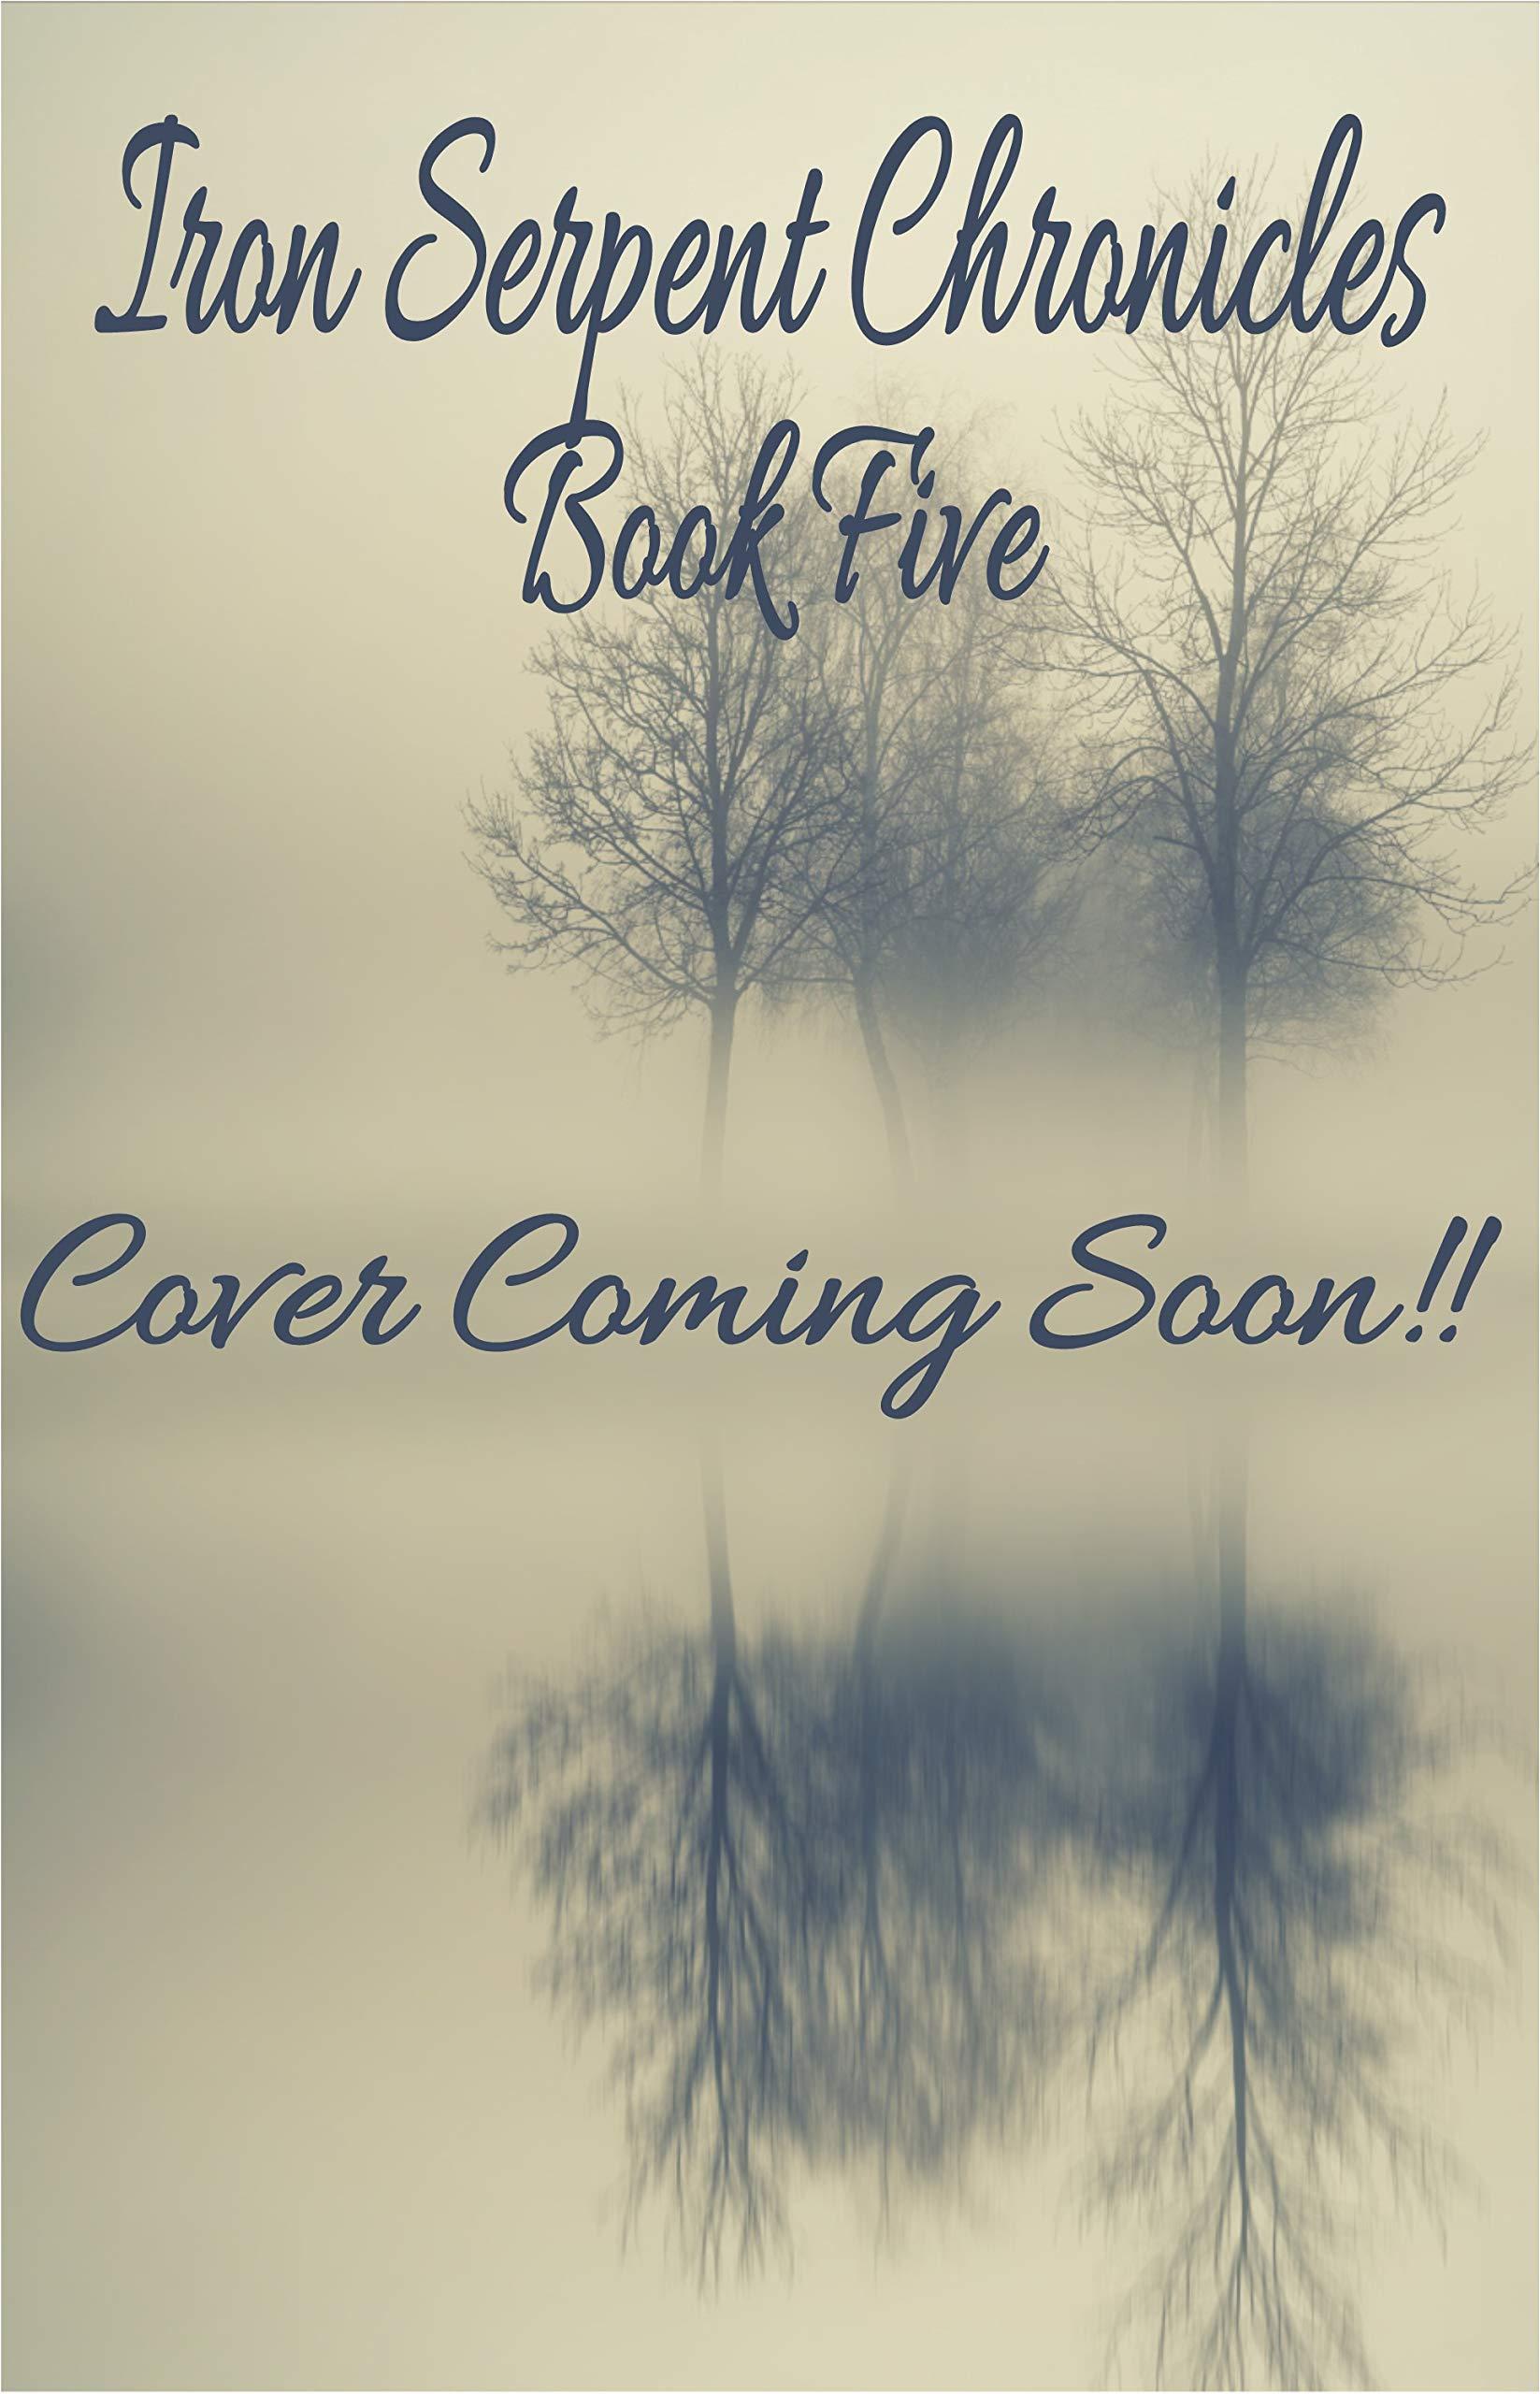 Magic Freed: A Paranormal Reverse Harem Romance Novel (Iron Serpent Chronicles Book 5)